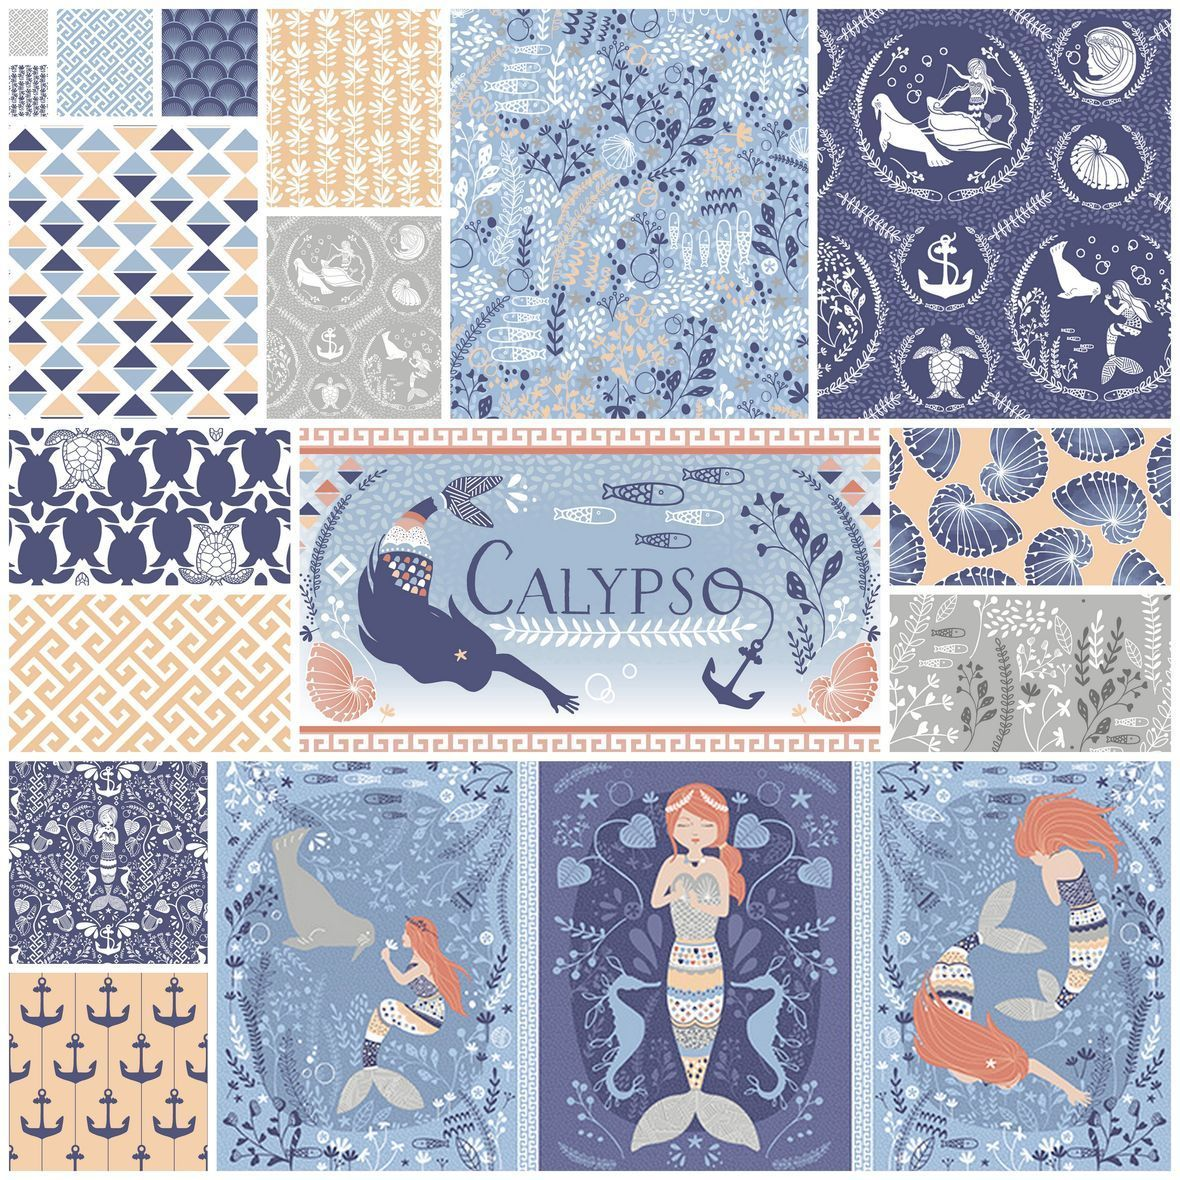 Calypso Palette in Poseidon